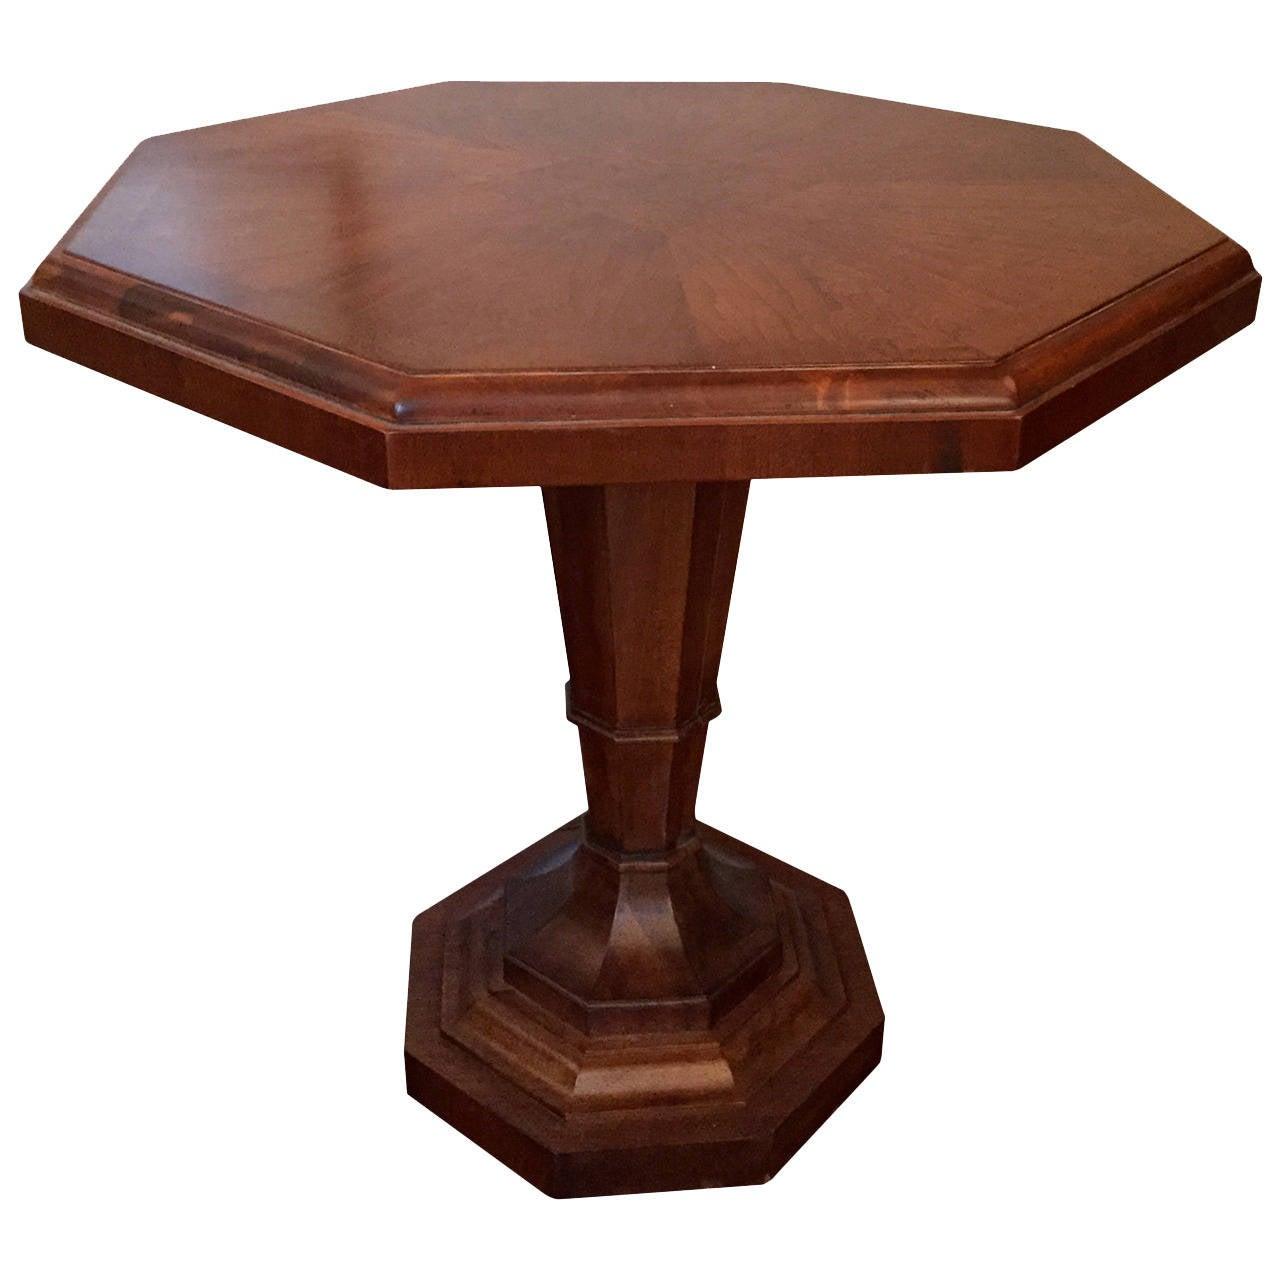 Regency Style Octagonal Pedestal Table For Sale At 1stdibs